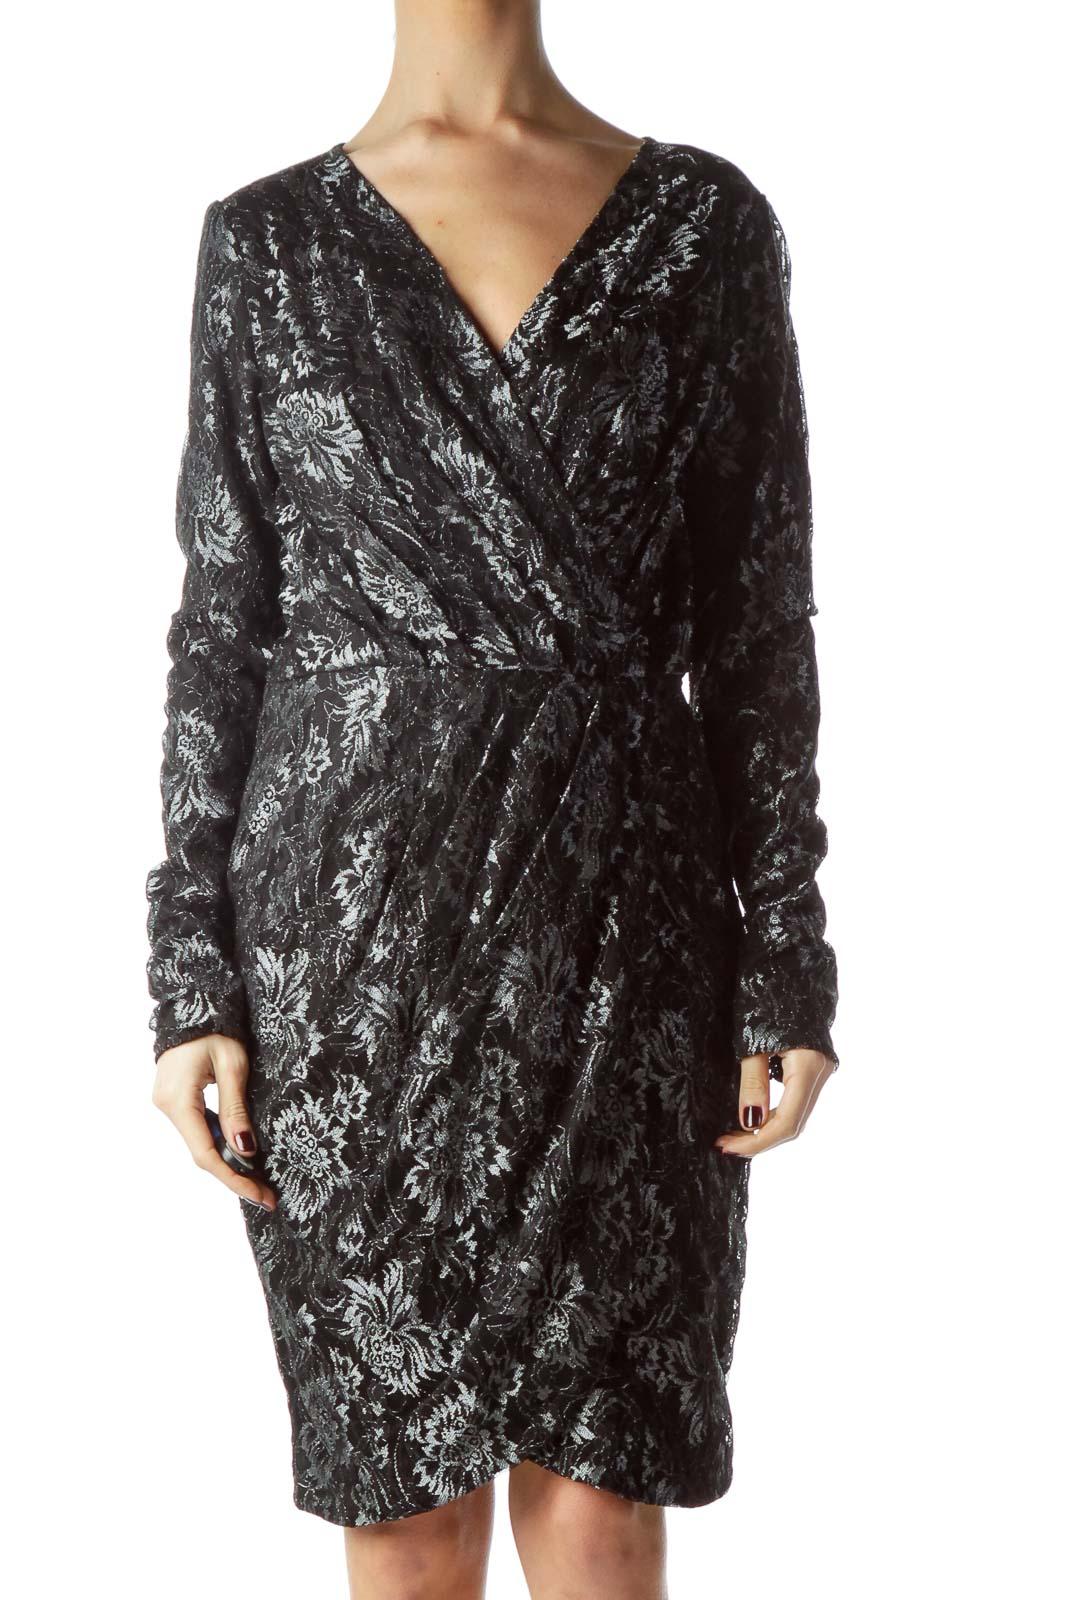 Black Silver Metallic Thread Lace Dress Front